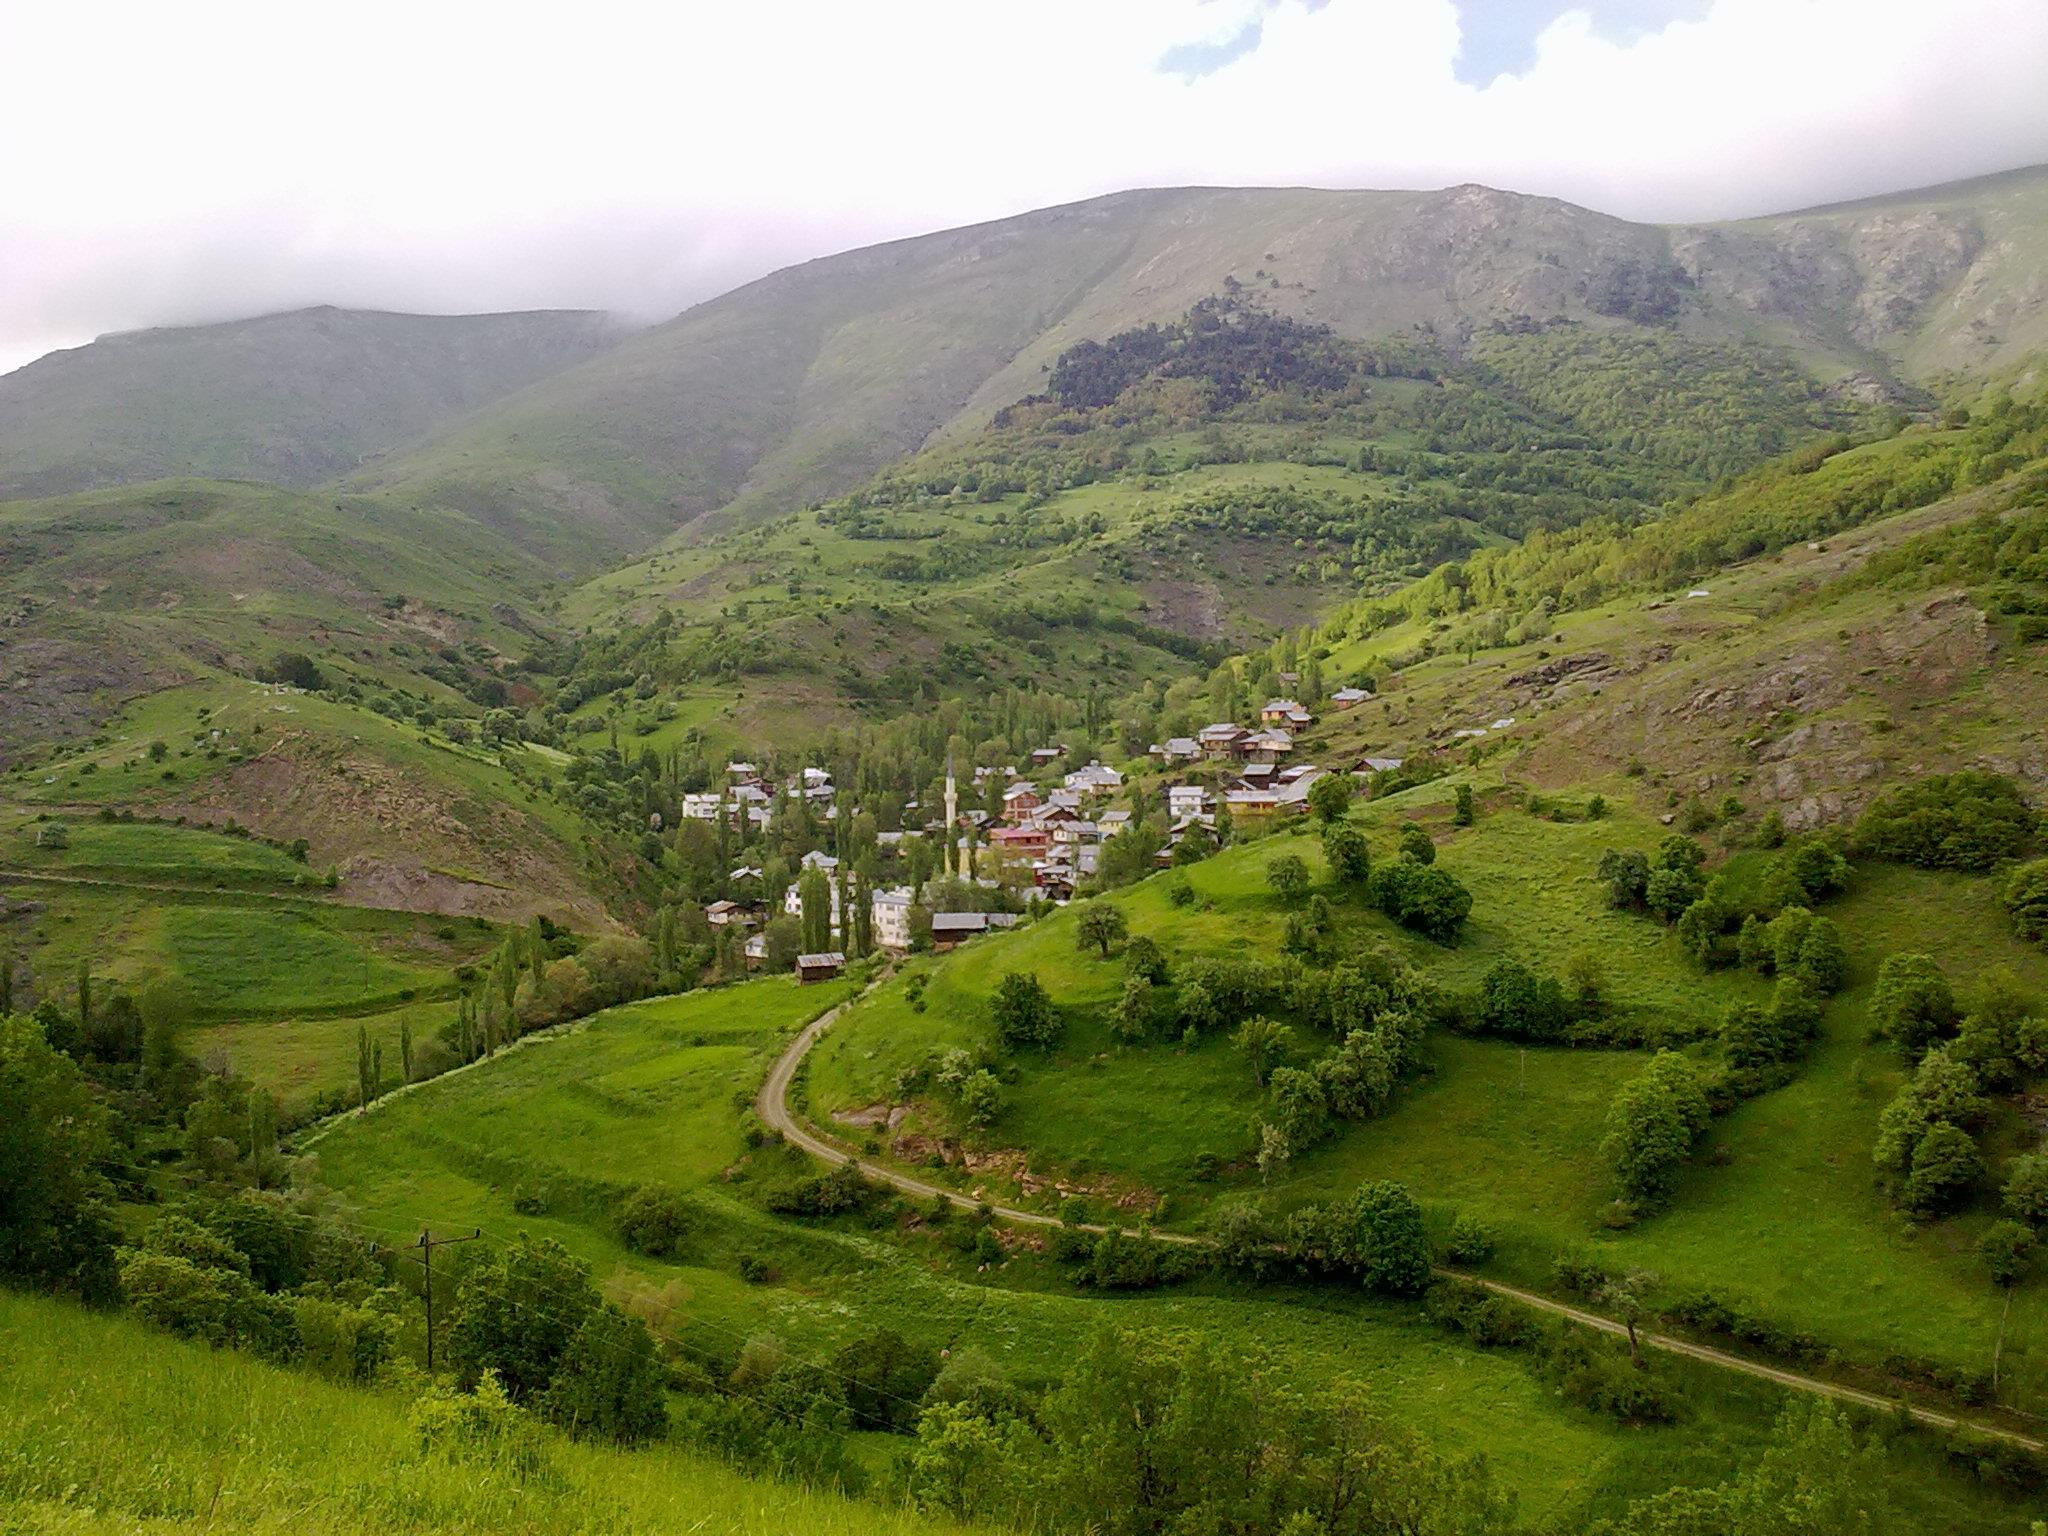 herközü köyü